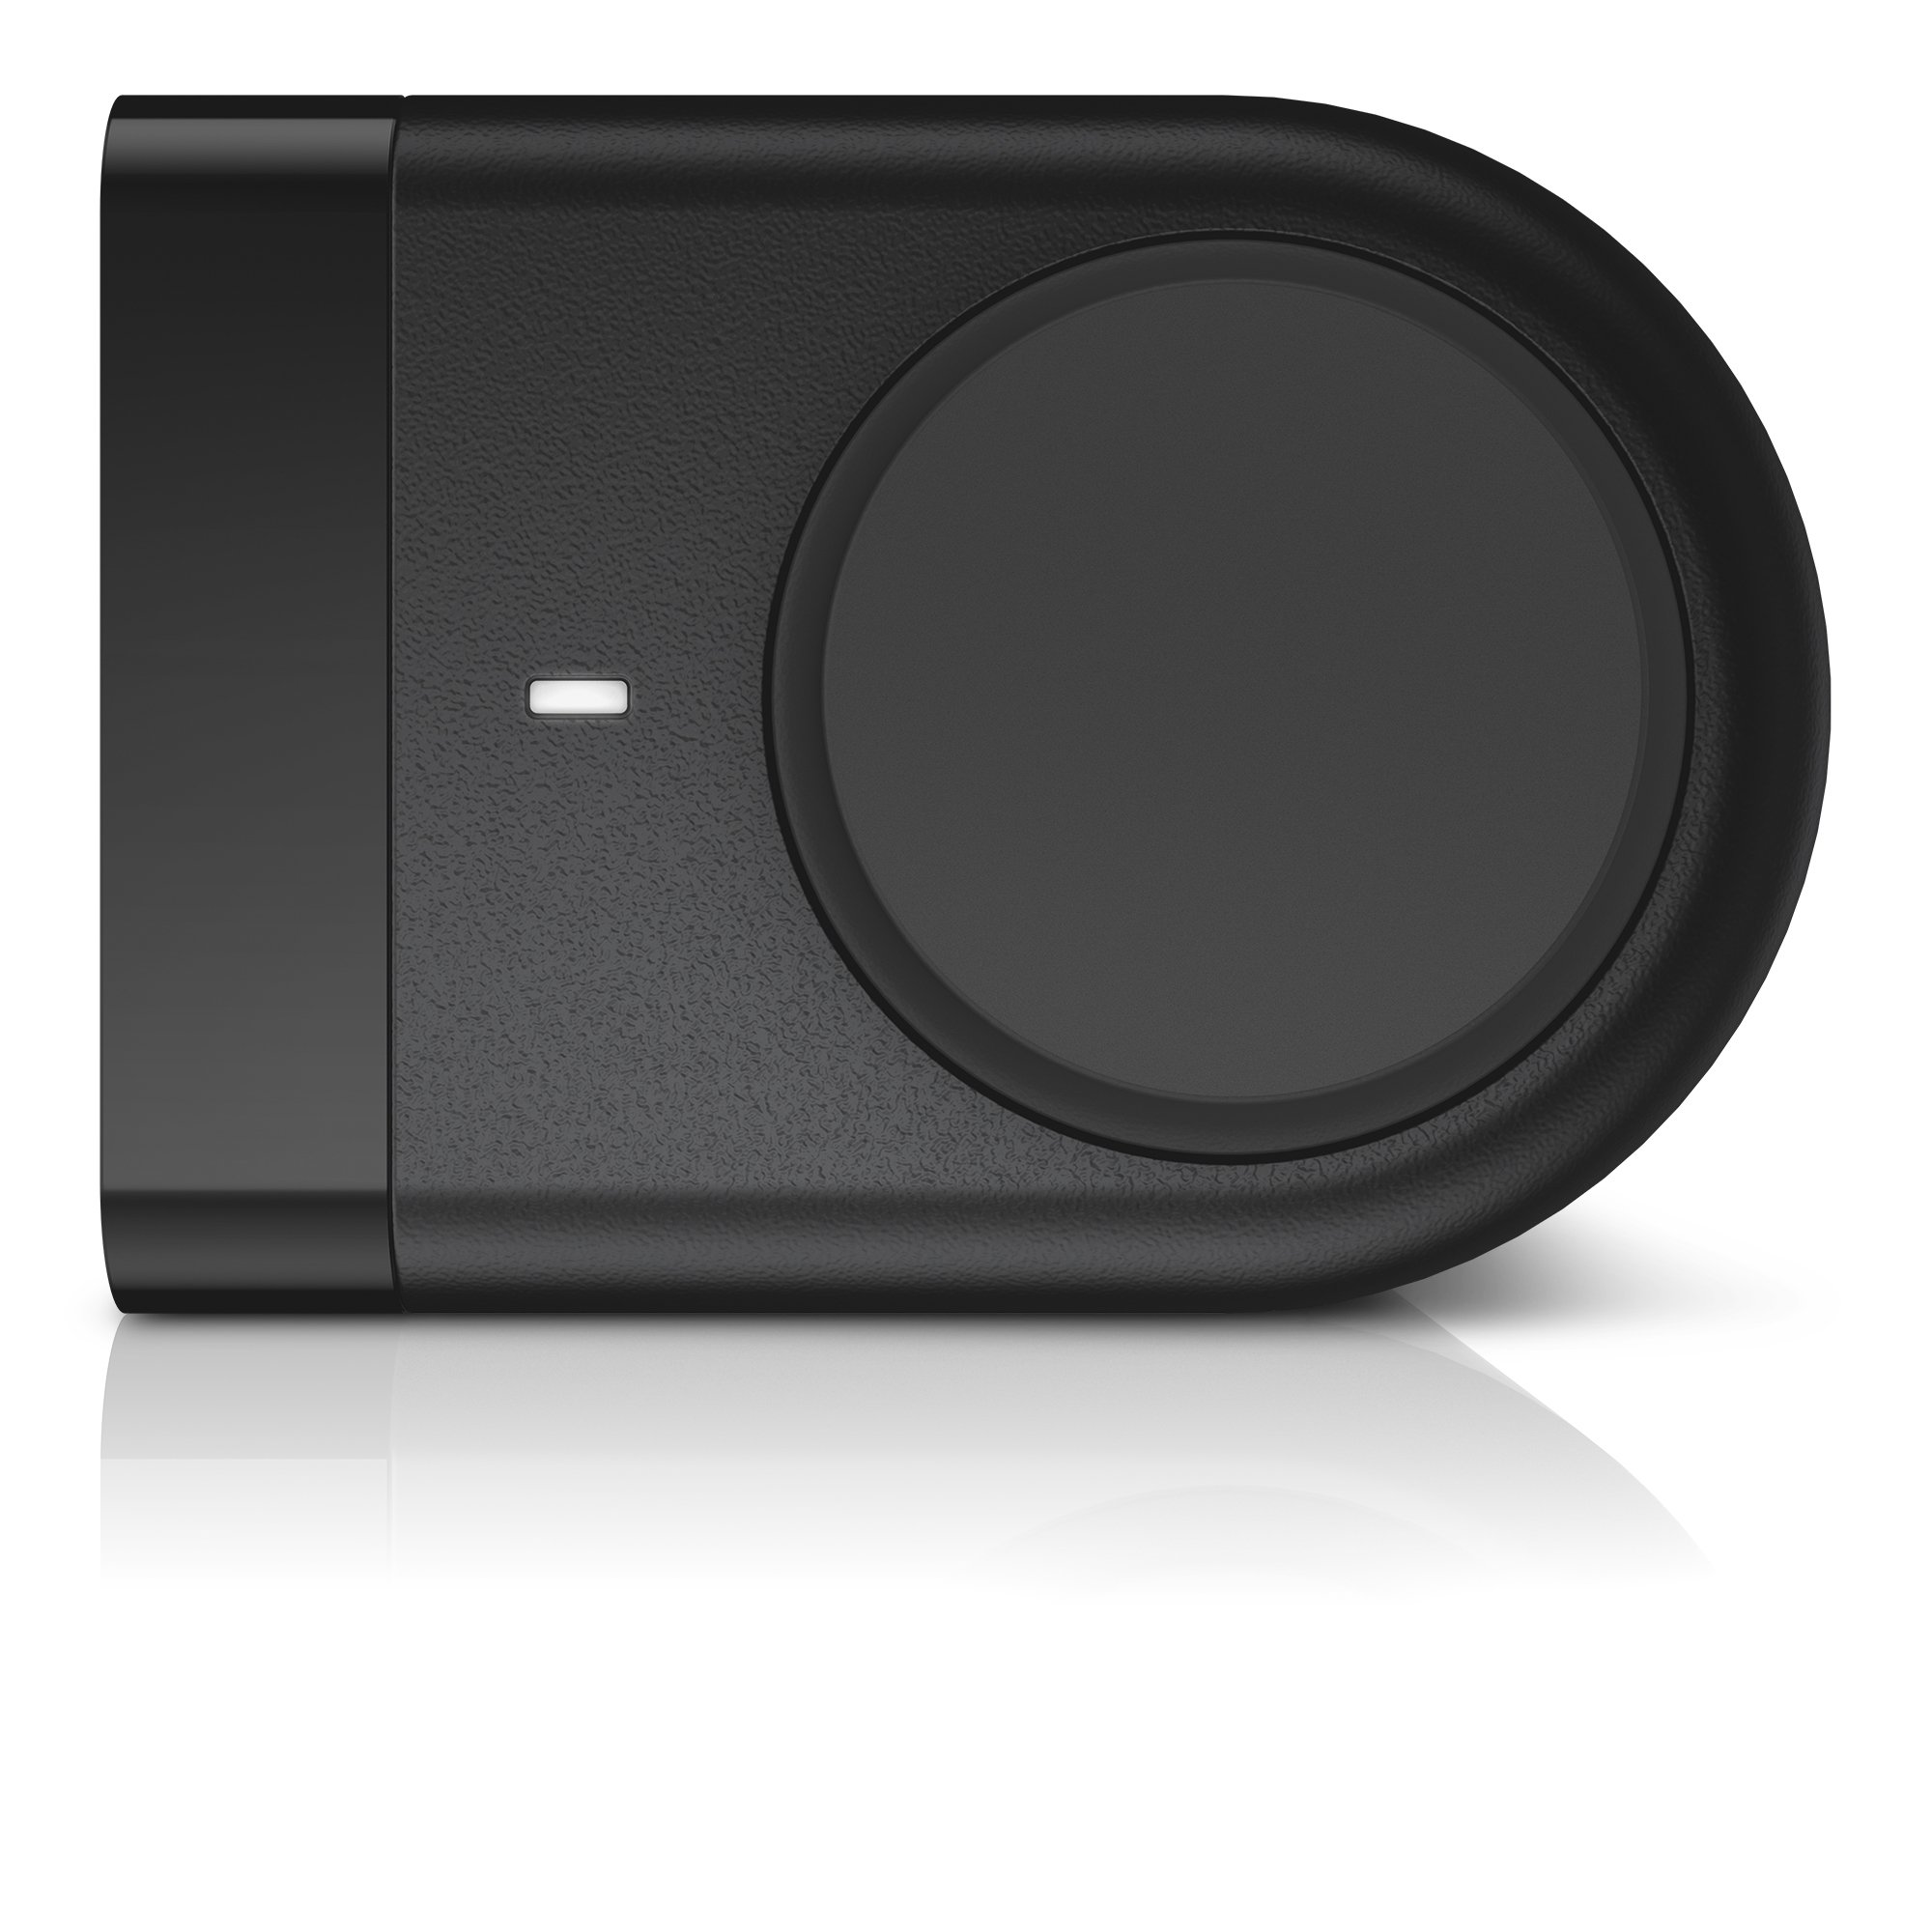 Dell AC511 USB Wired SoundBar by Dell (Image #2)